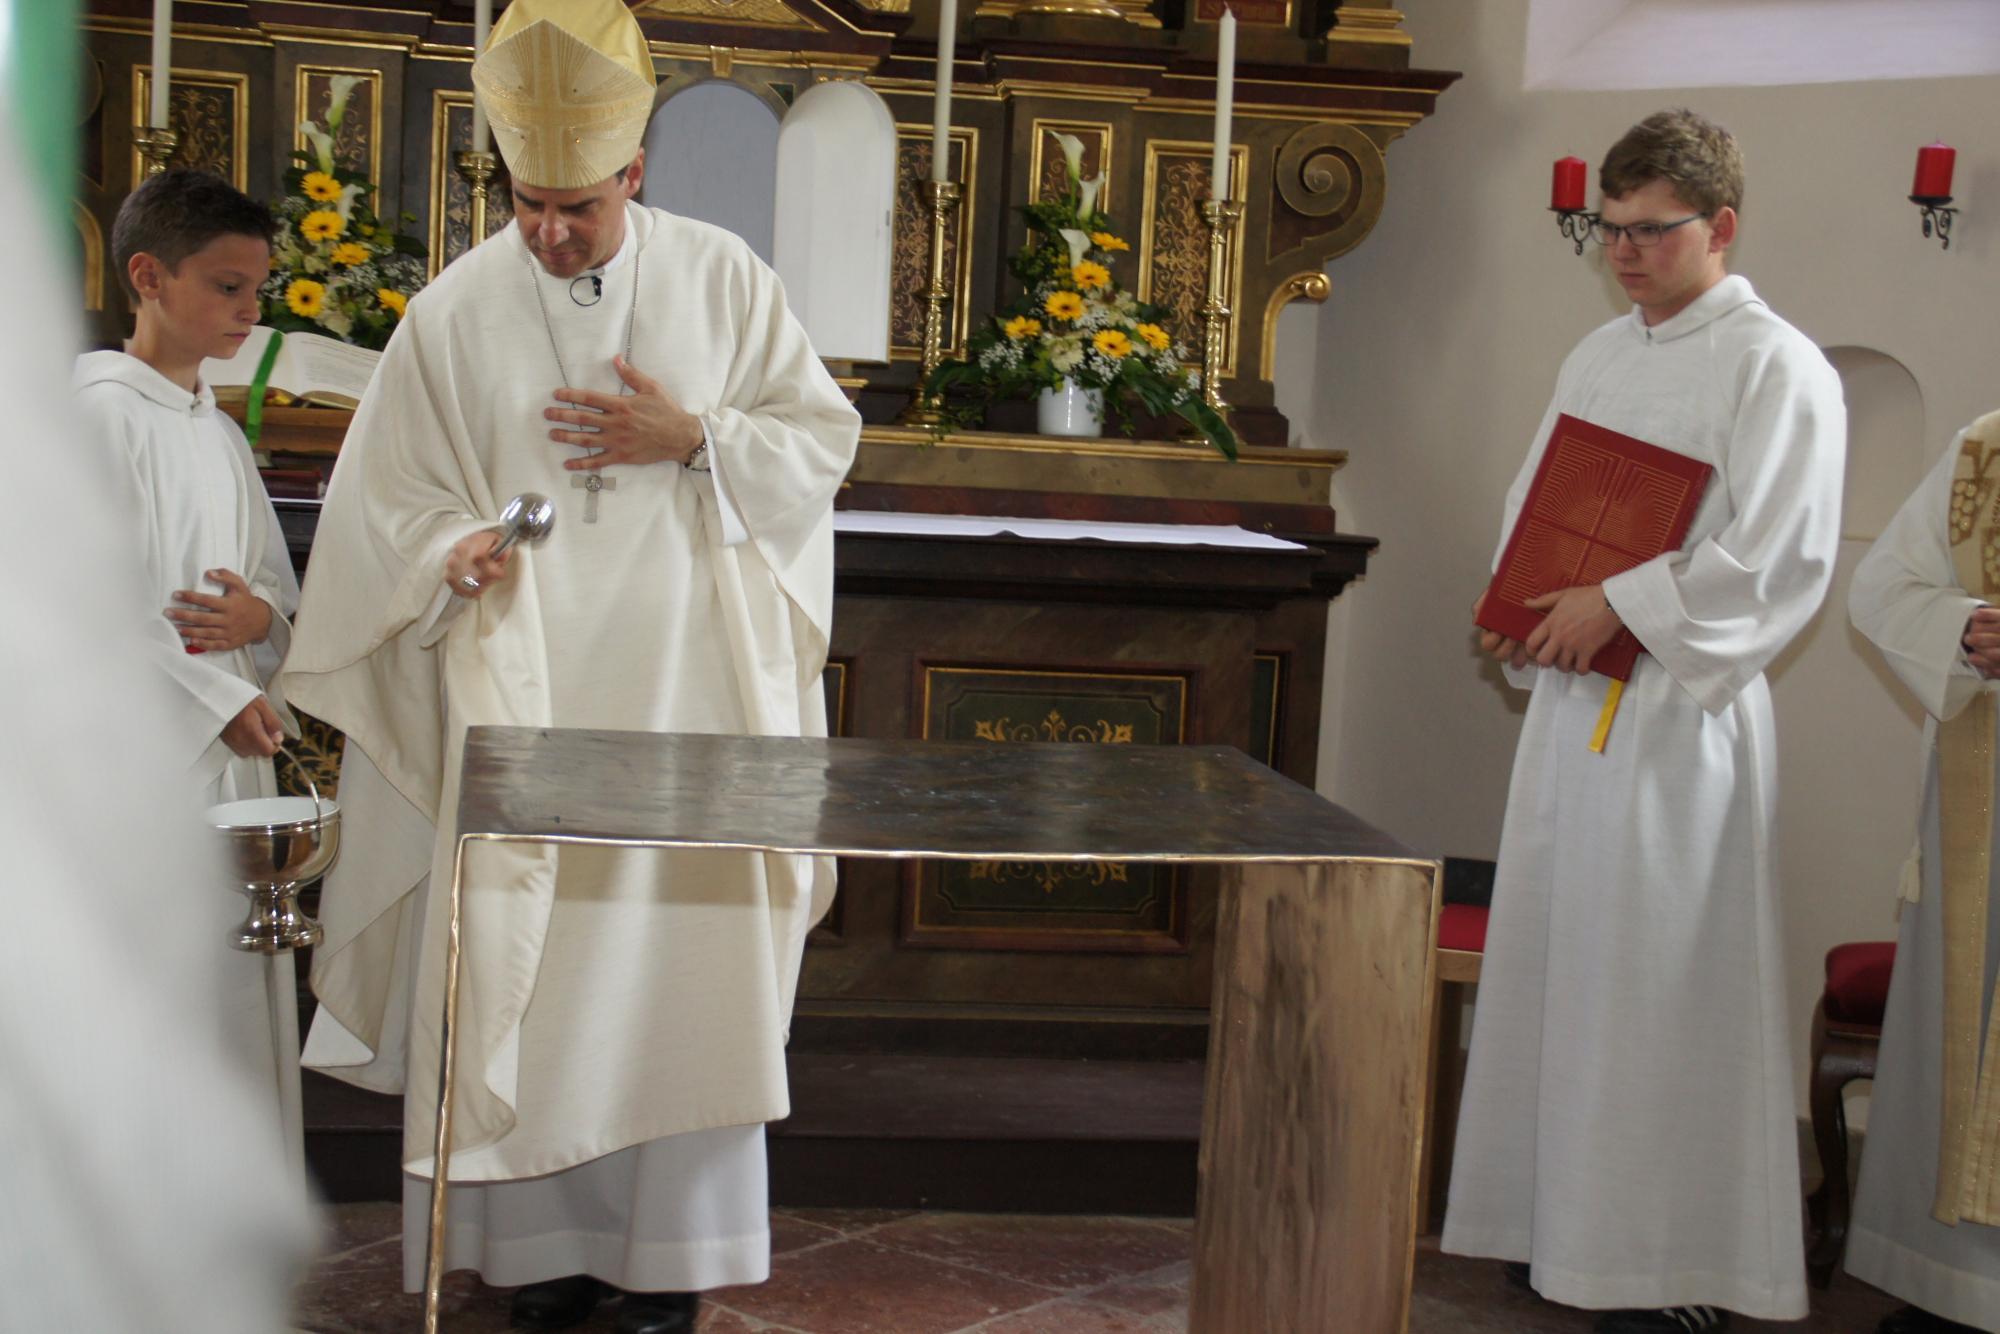 Altarweihe-Lengsham-DSC06295